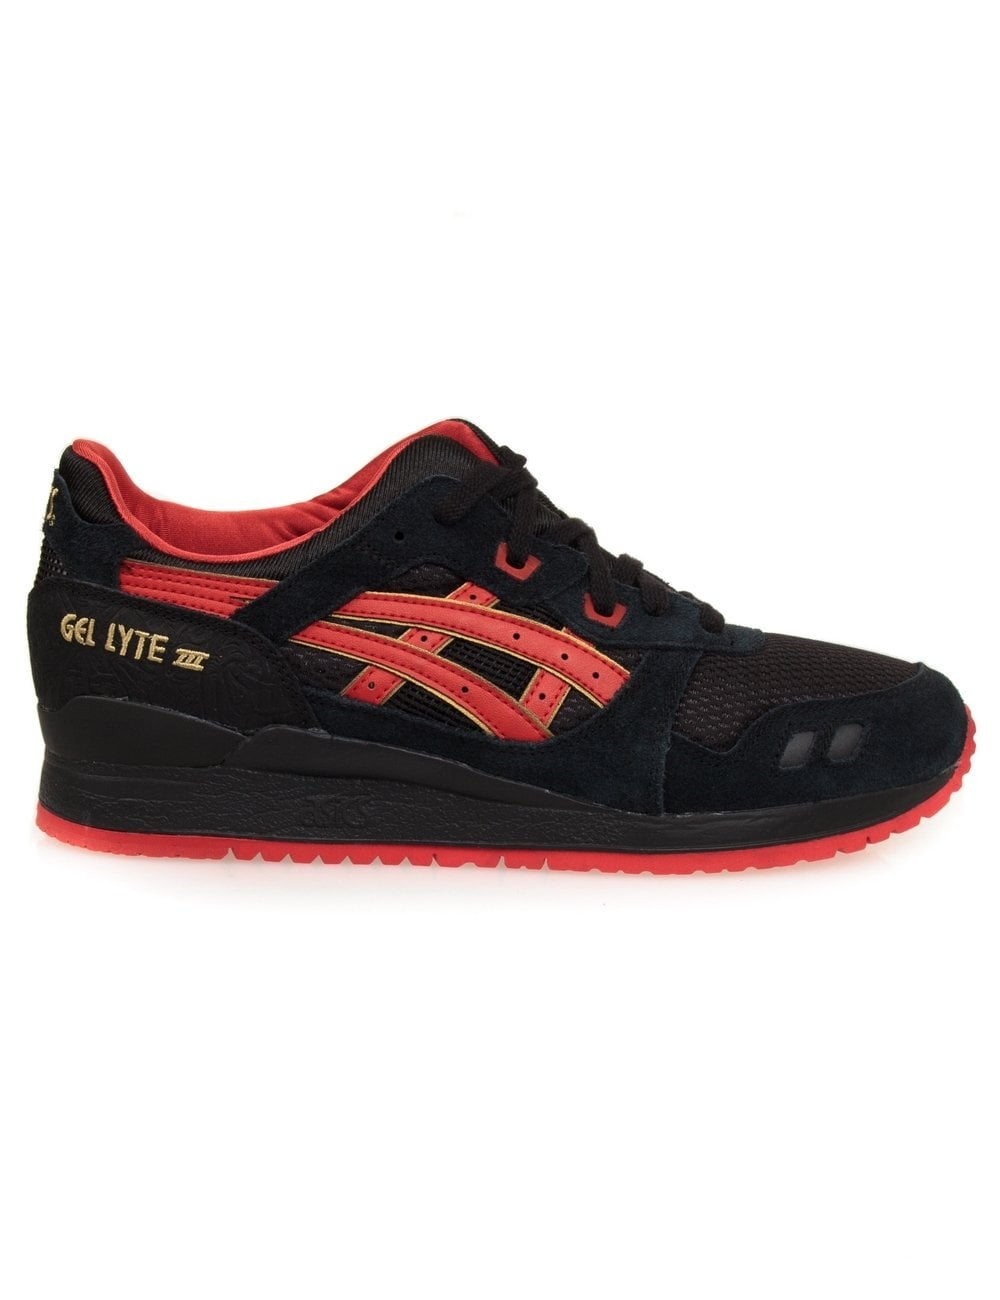 on sale 2e1b8 9fe69 Gel Lyte III - Valentines Pack - Black/Black